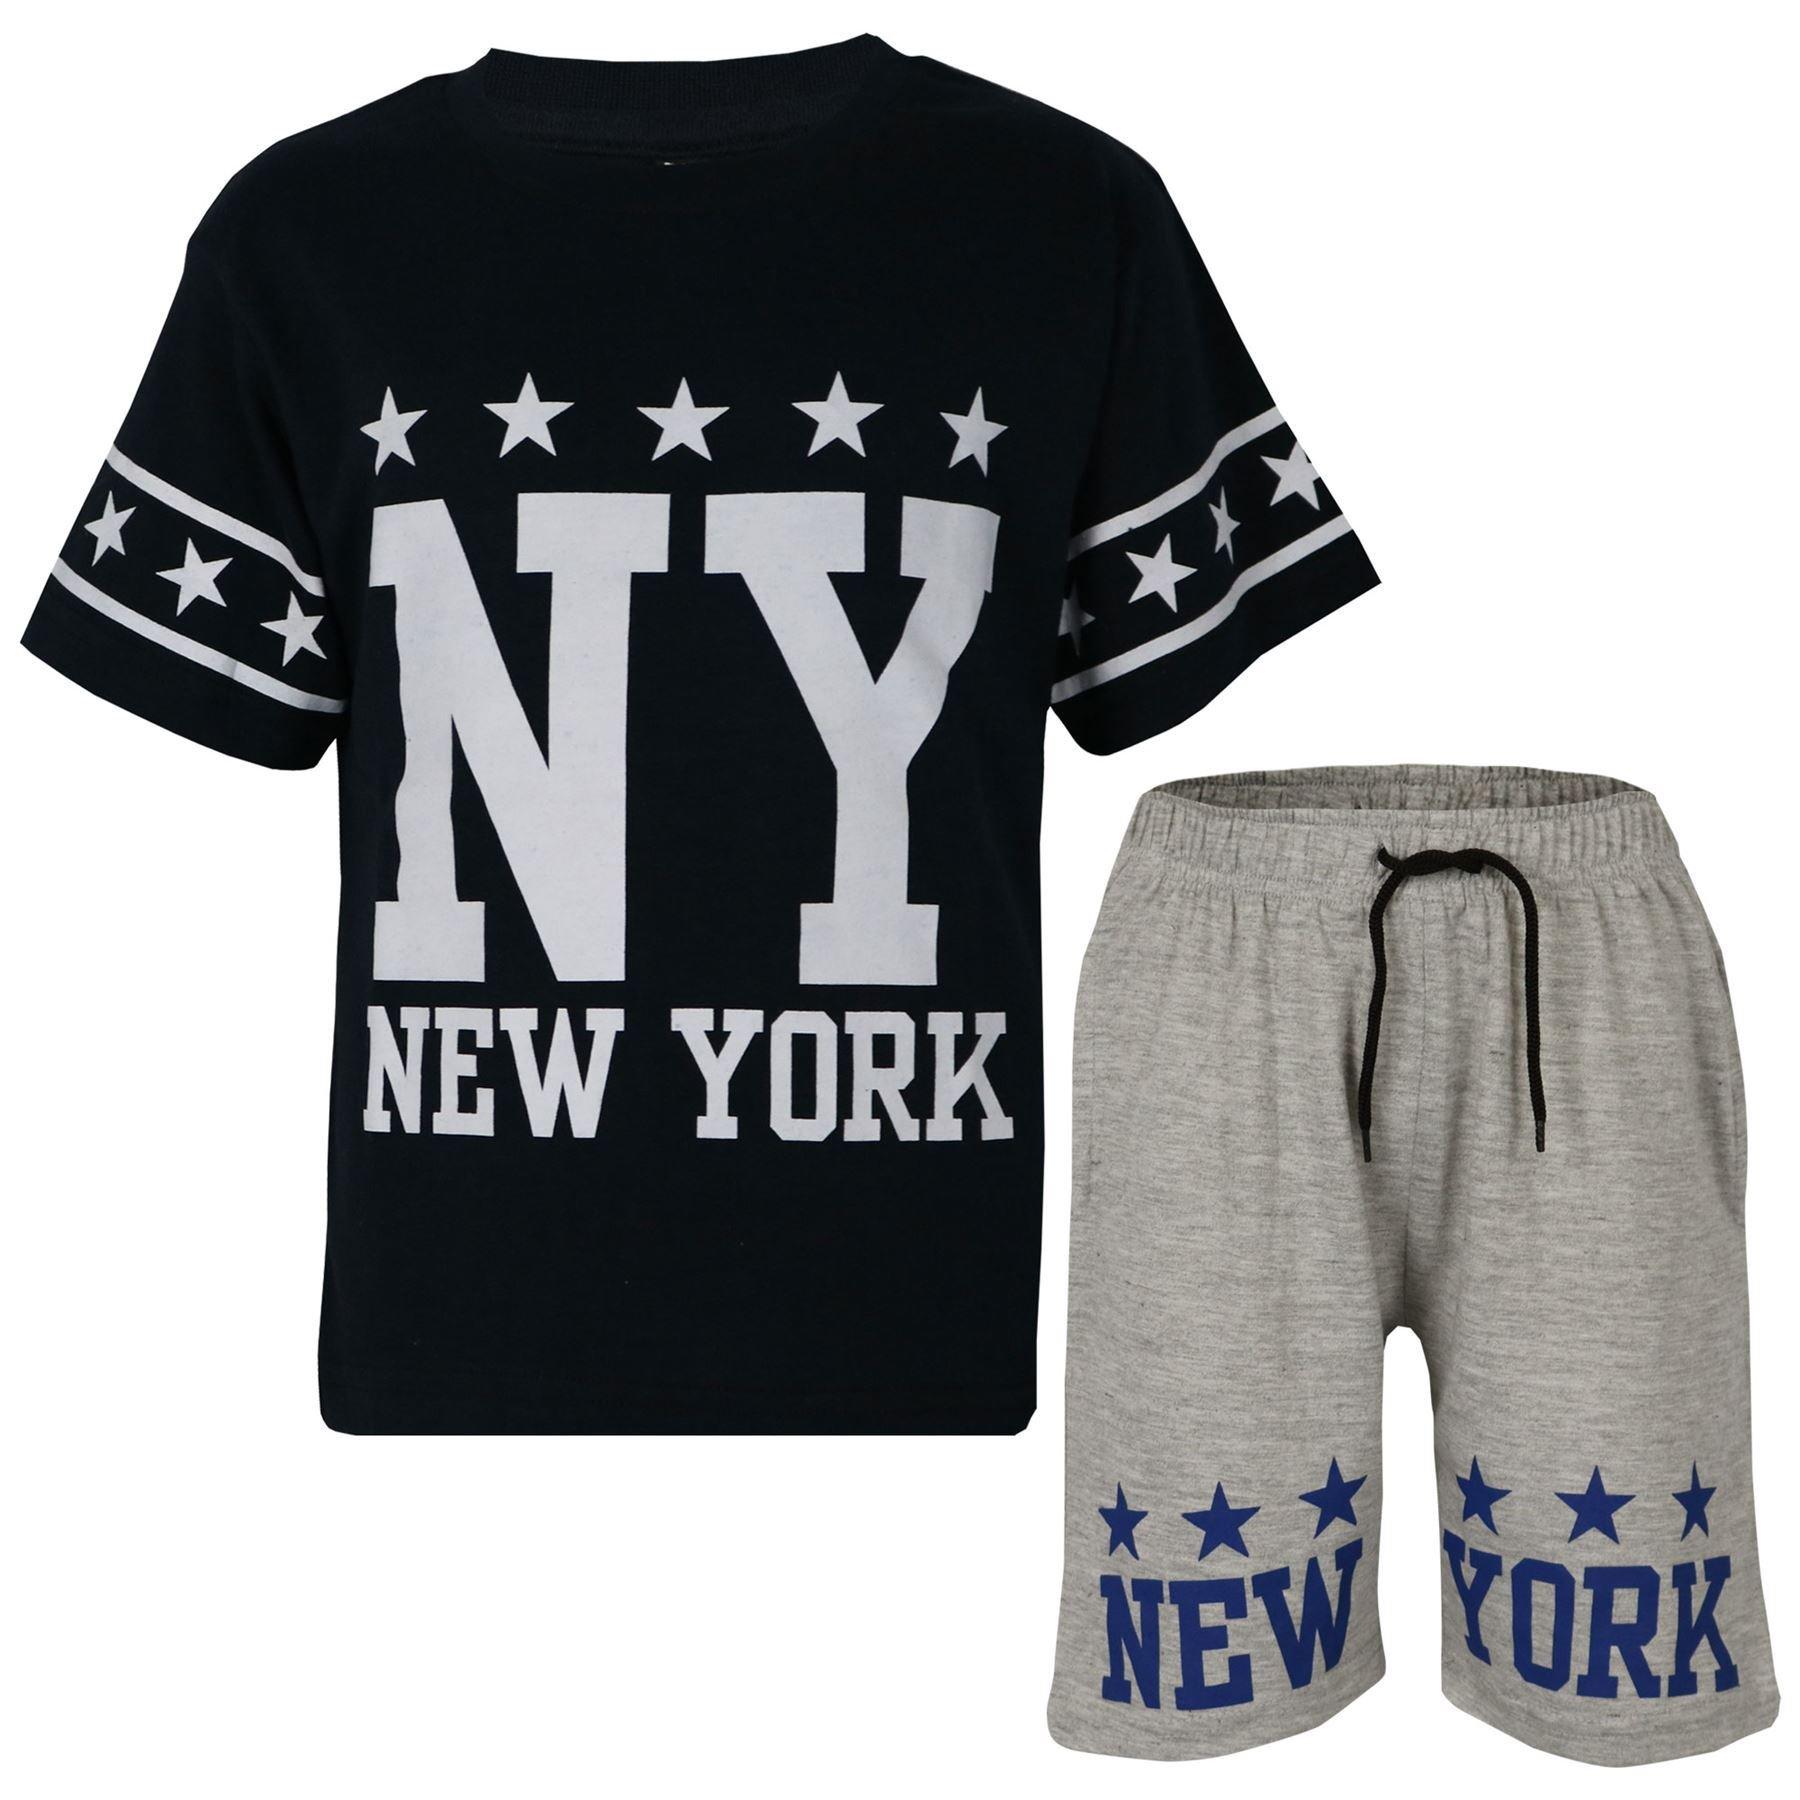 Kids Boys Girls T Shirts Shorts 100% Cotton NY New York Top Short Set 5-13 Years